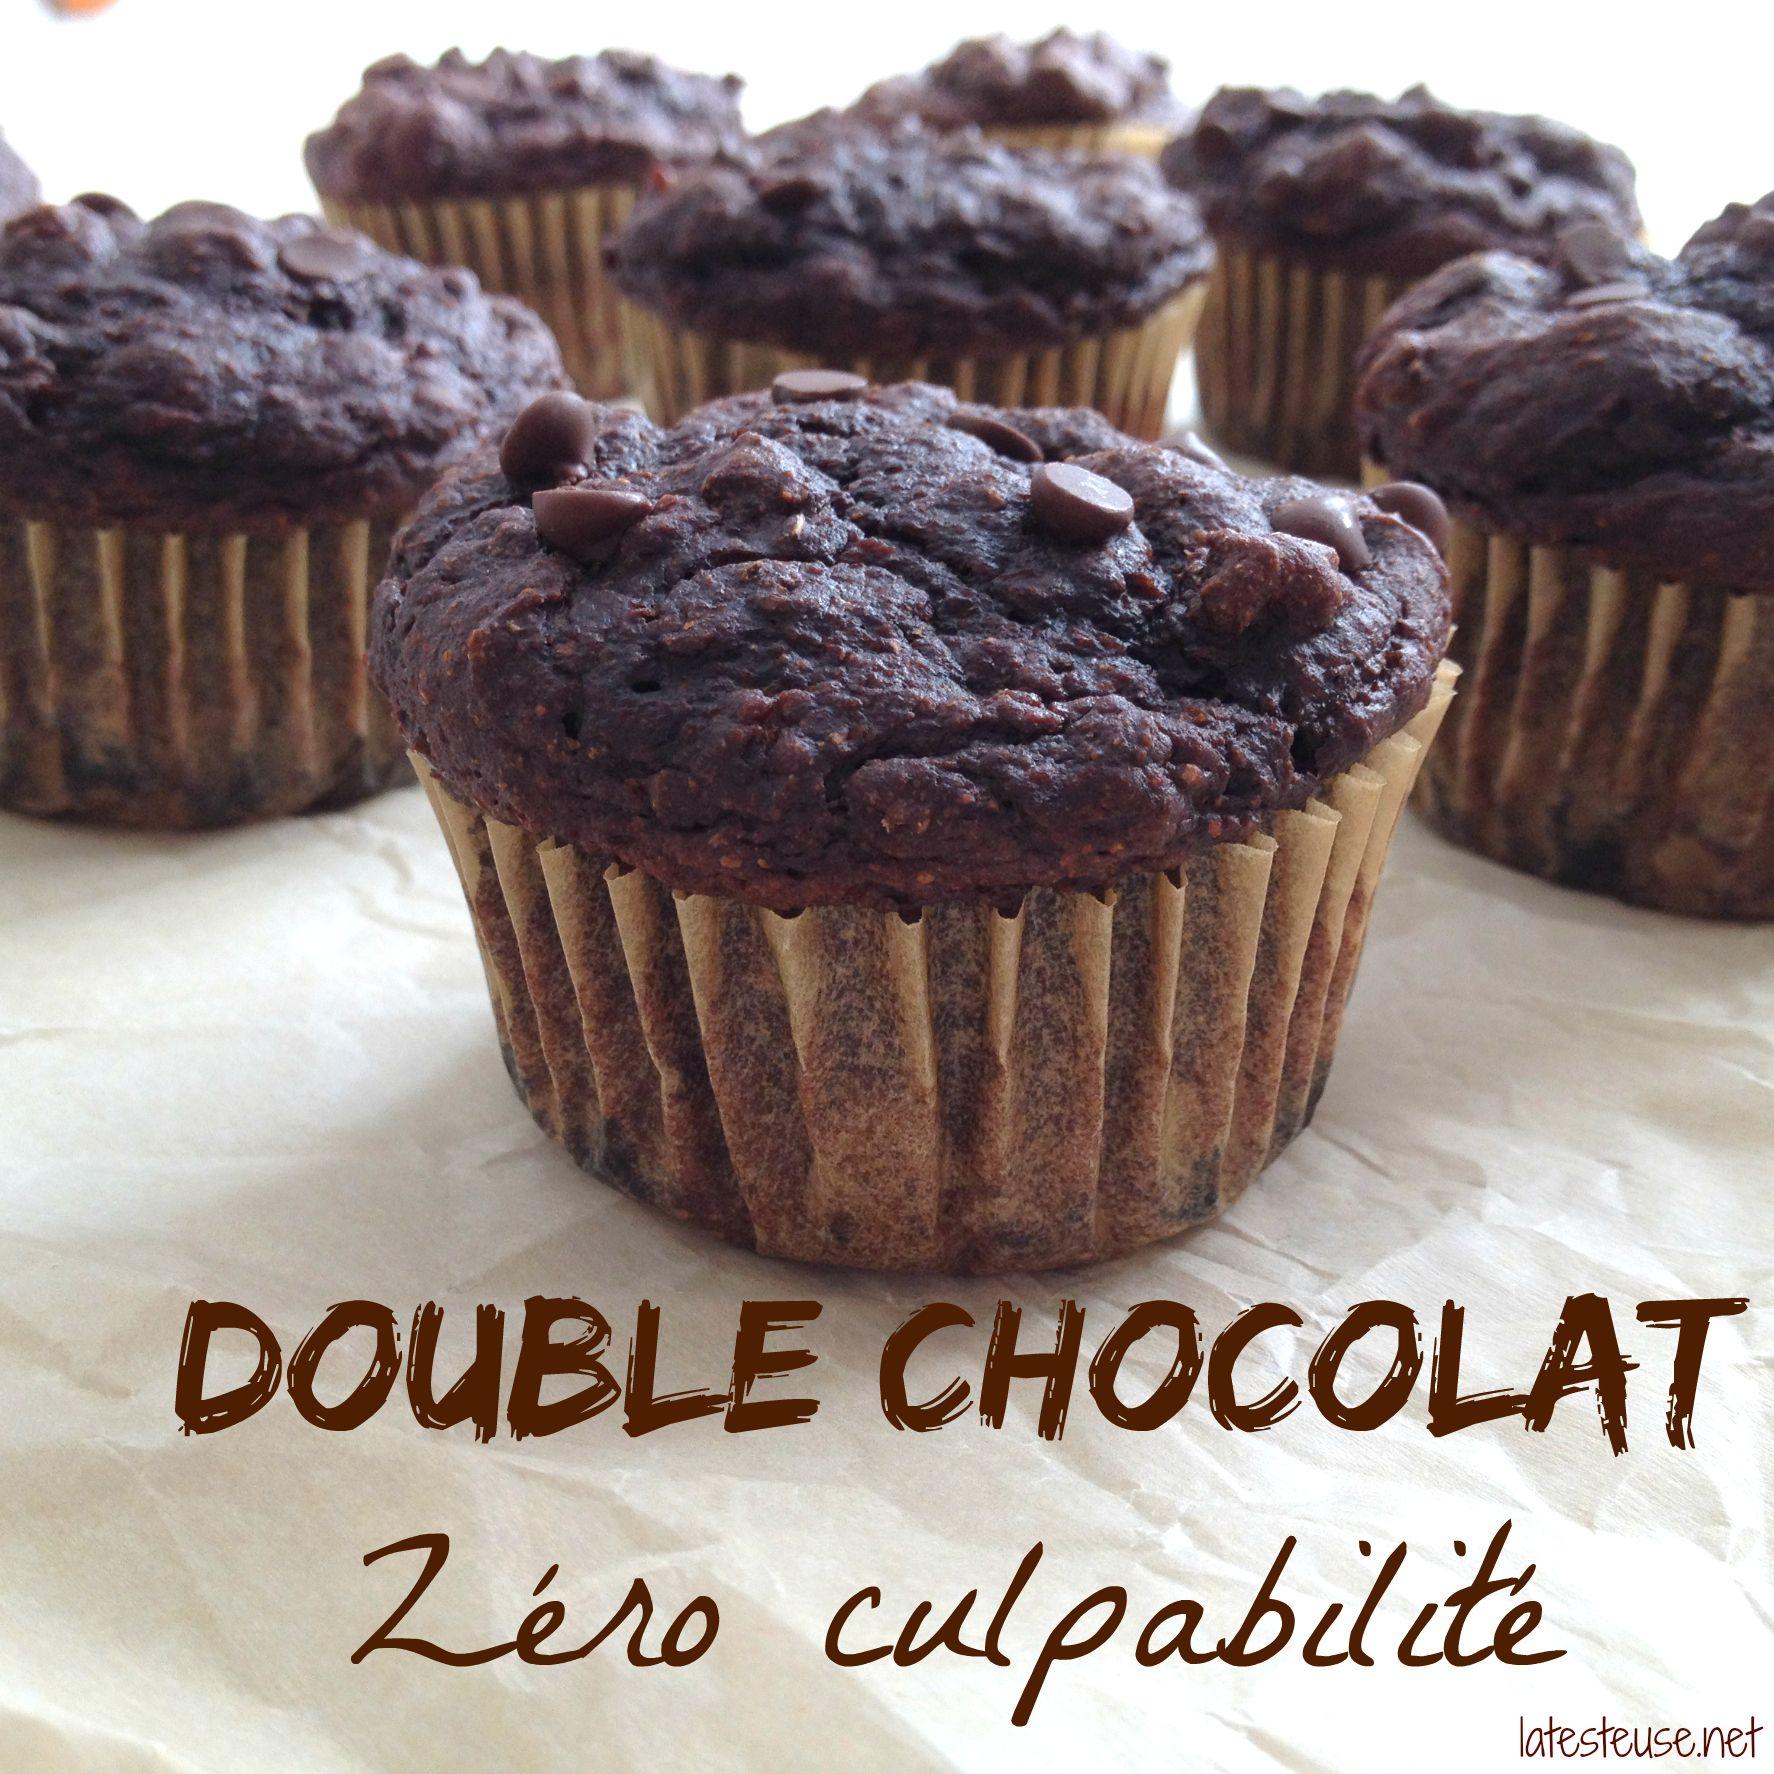 Muffin double chocolat Zéro culpabilité | Receta | Postres faciles, Recetas de comida y Desayuno ...